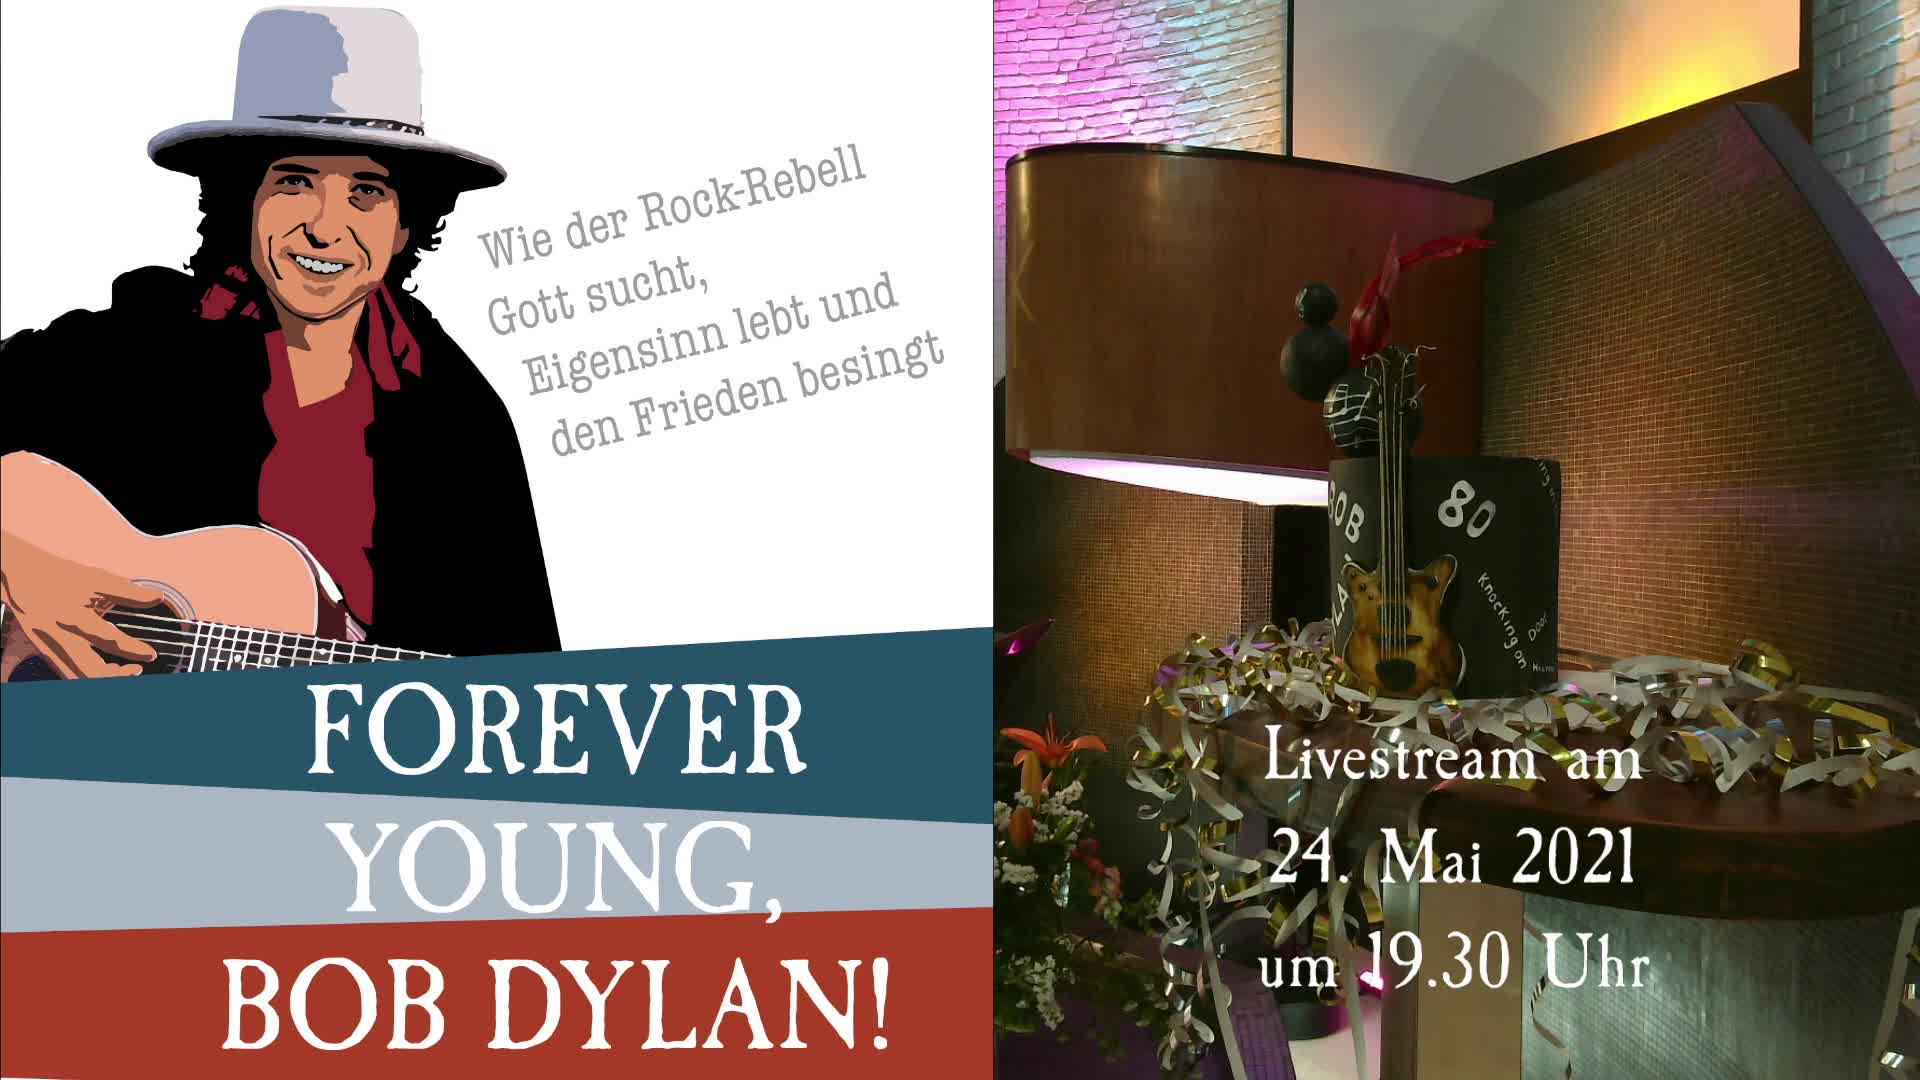 Schönen guten Abend! Bob Dylan, forever young!